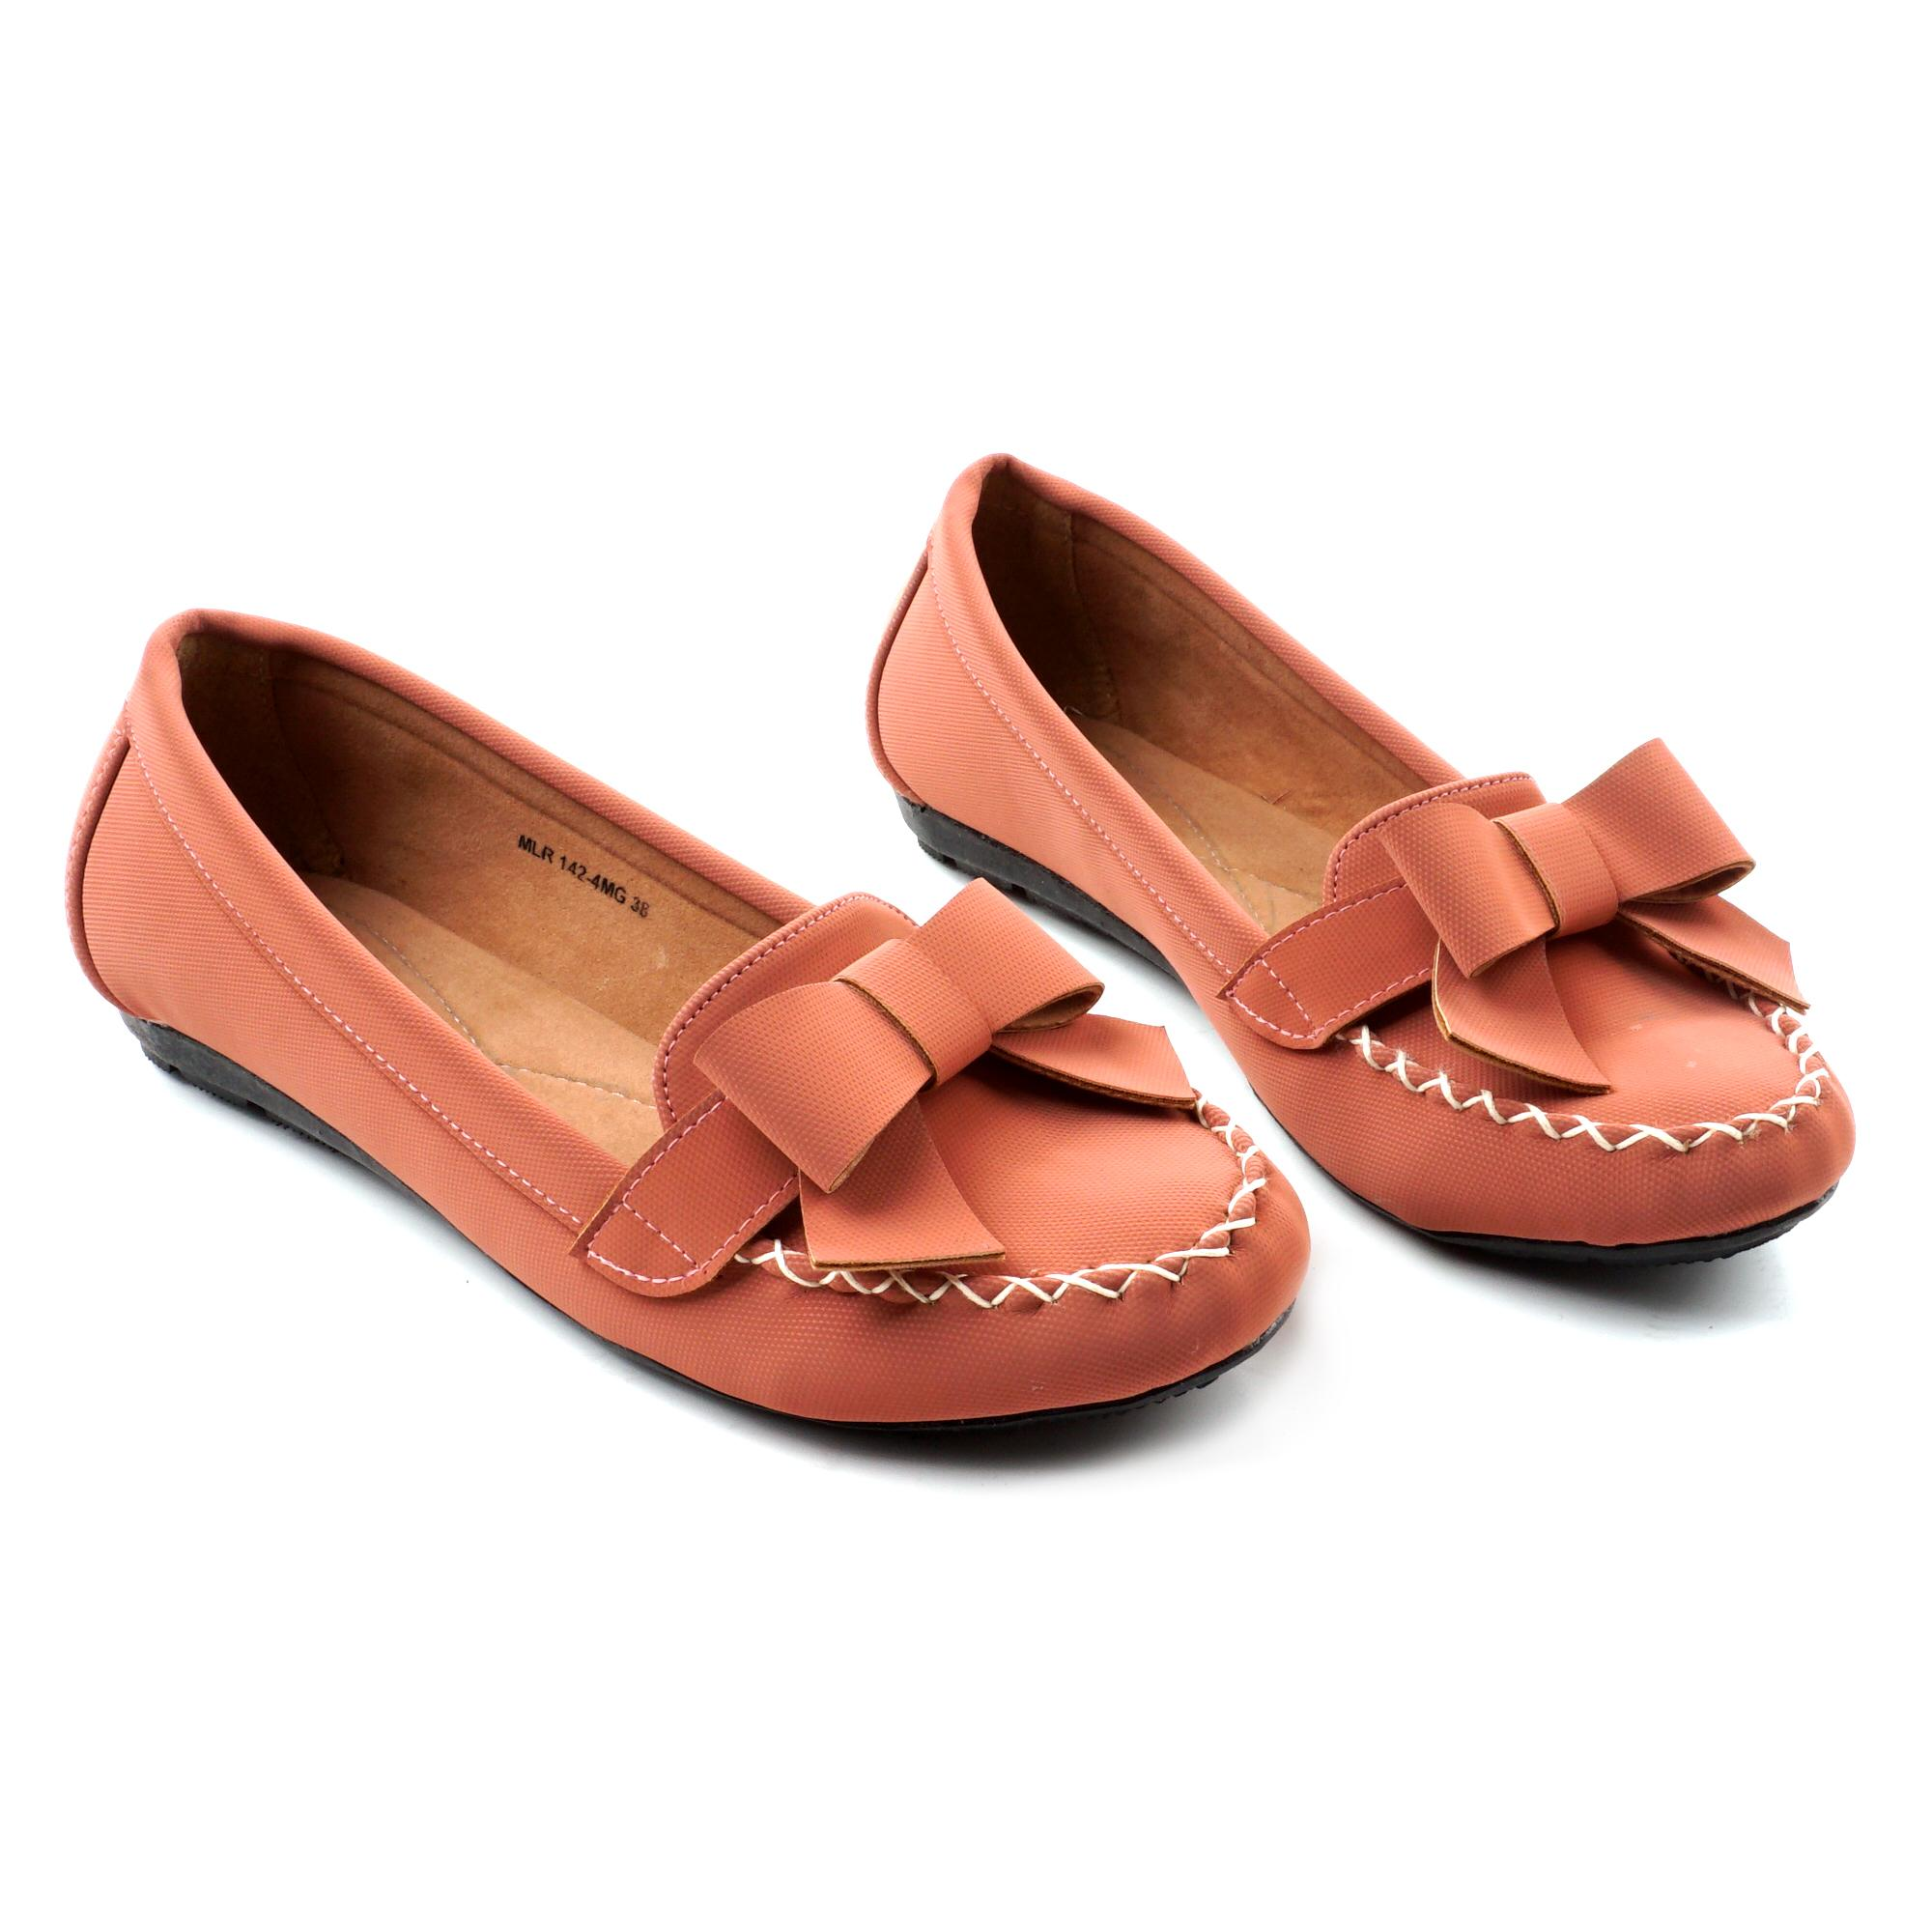 Pluvia Sepatu Flat Shoes Wanita Terbaru MLR MG04 Hitam Salem Navy